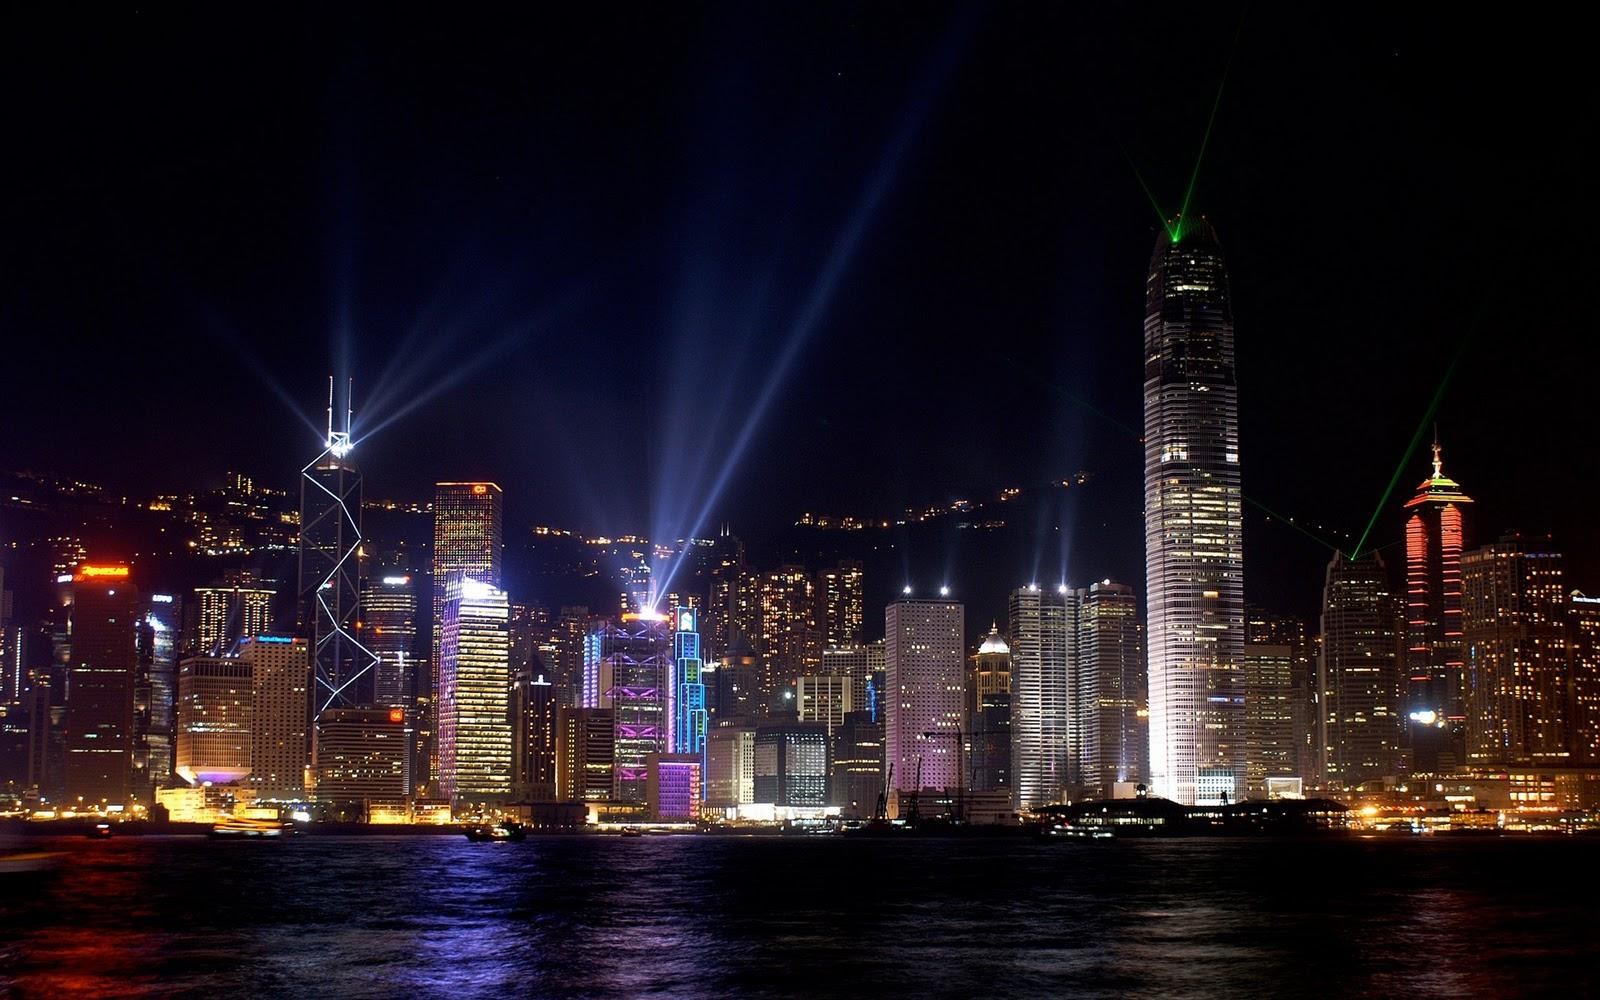 city lights nice wallpaper hd beautiful city lights wallpaper hd city 1600x1000